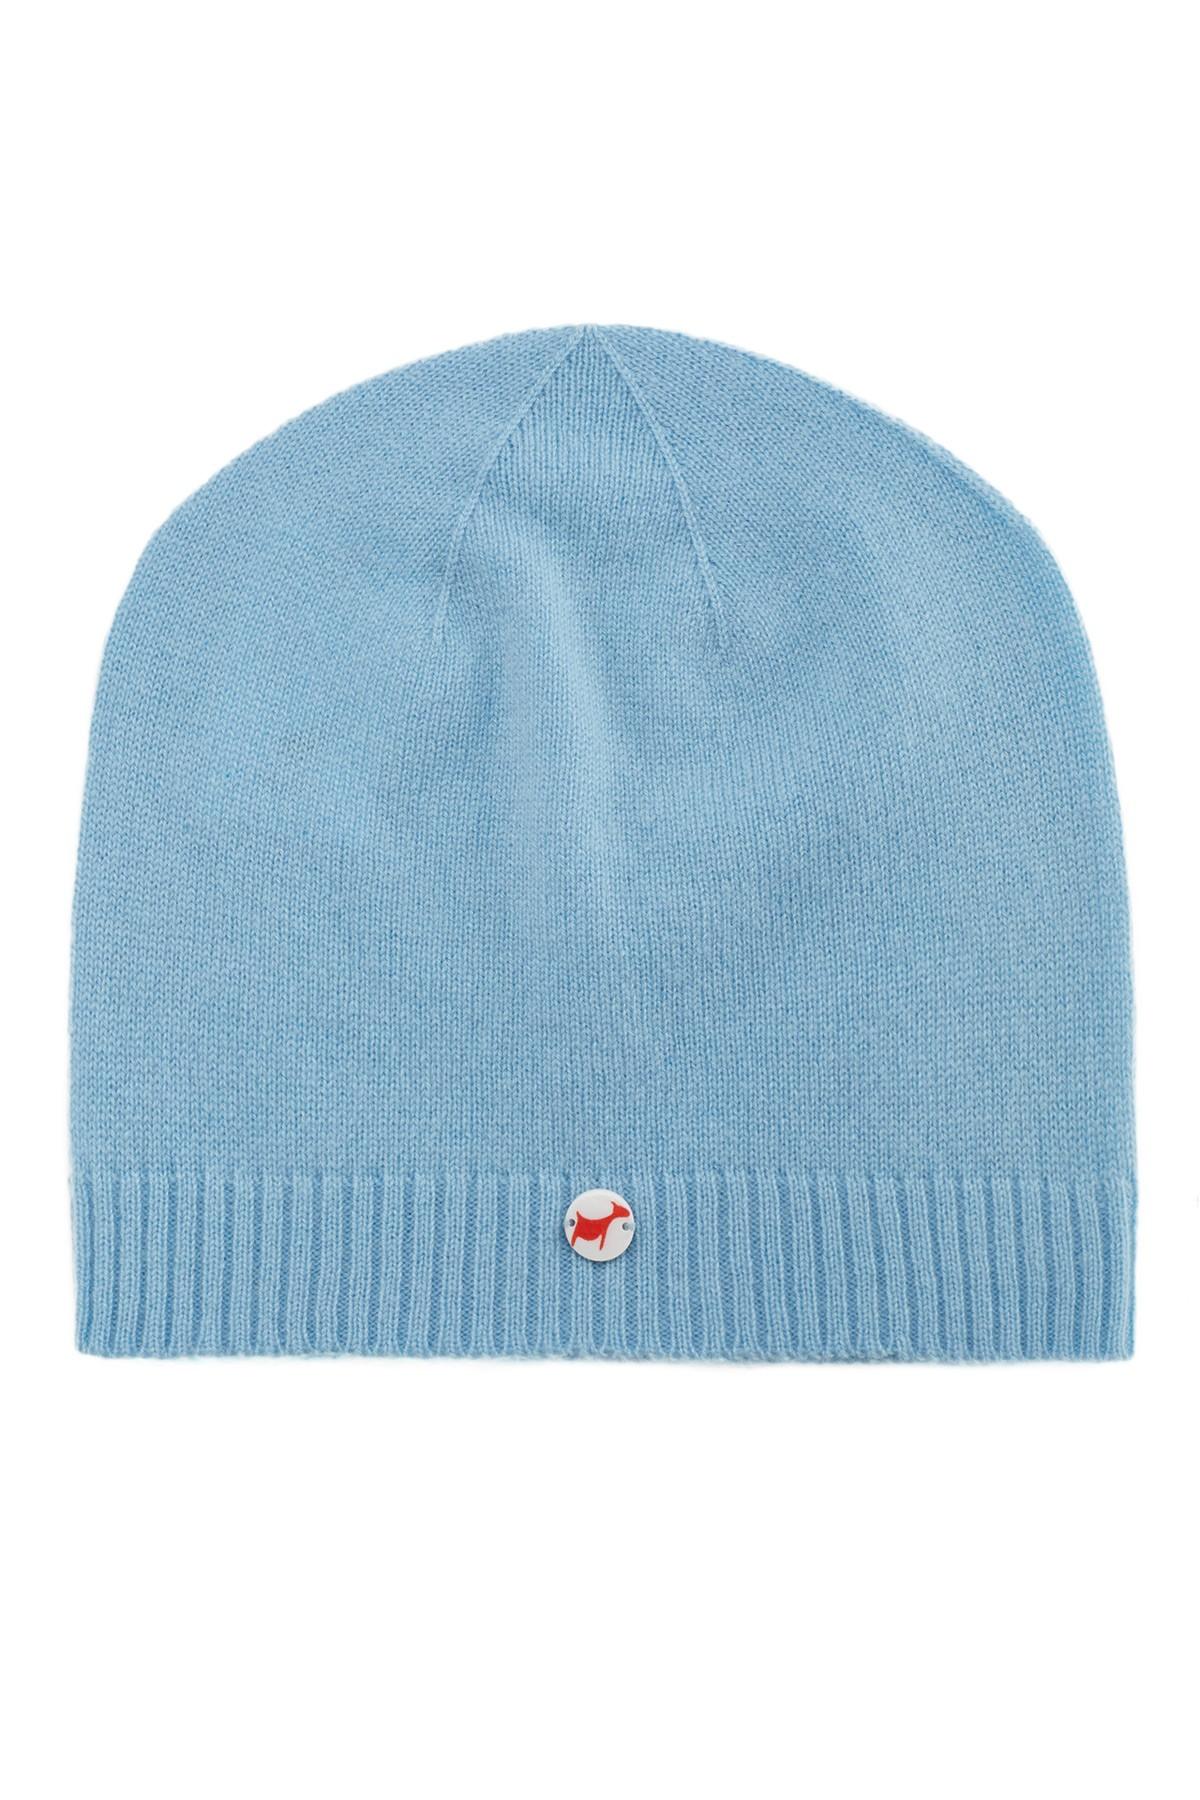 Fine knit cashmere baby cap air blue